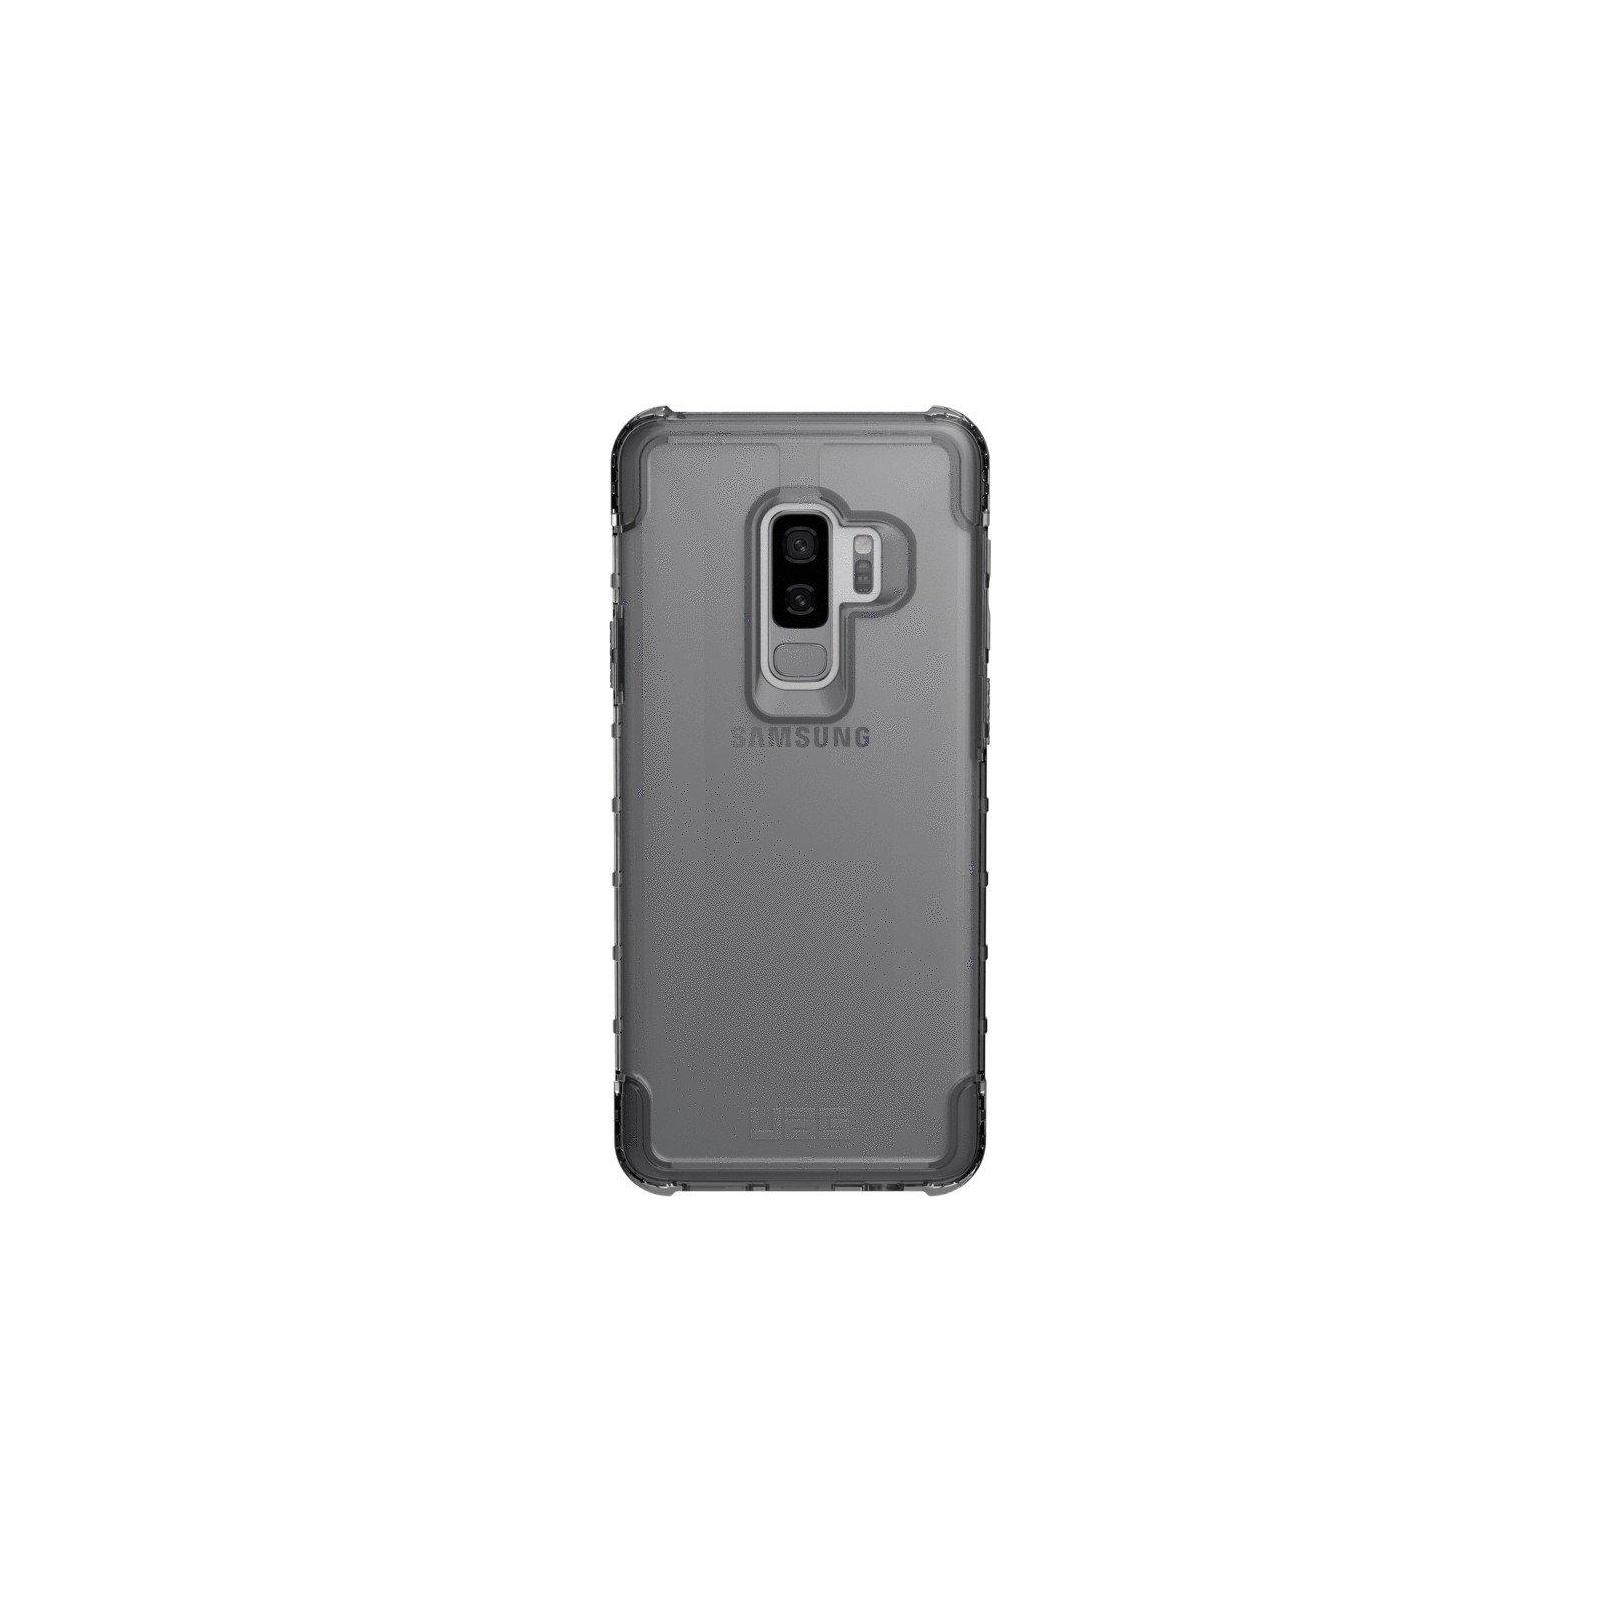 Чехол для моб. телефона UAG Galaxy S9+ Plyo Ice (GLXS9PLS-Y-IC)